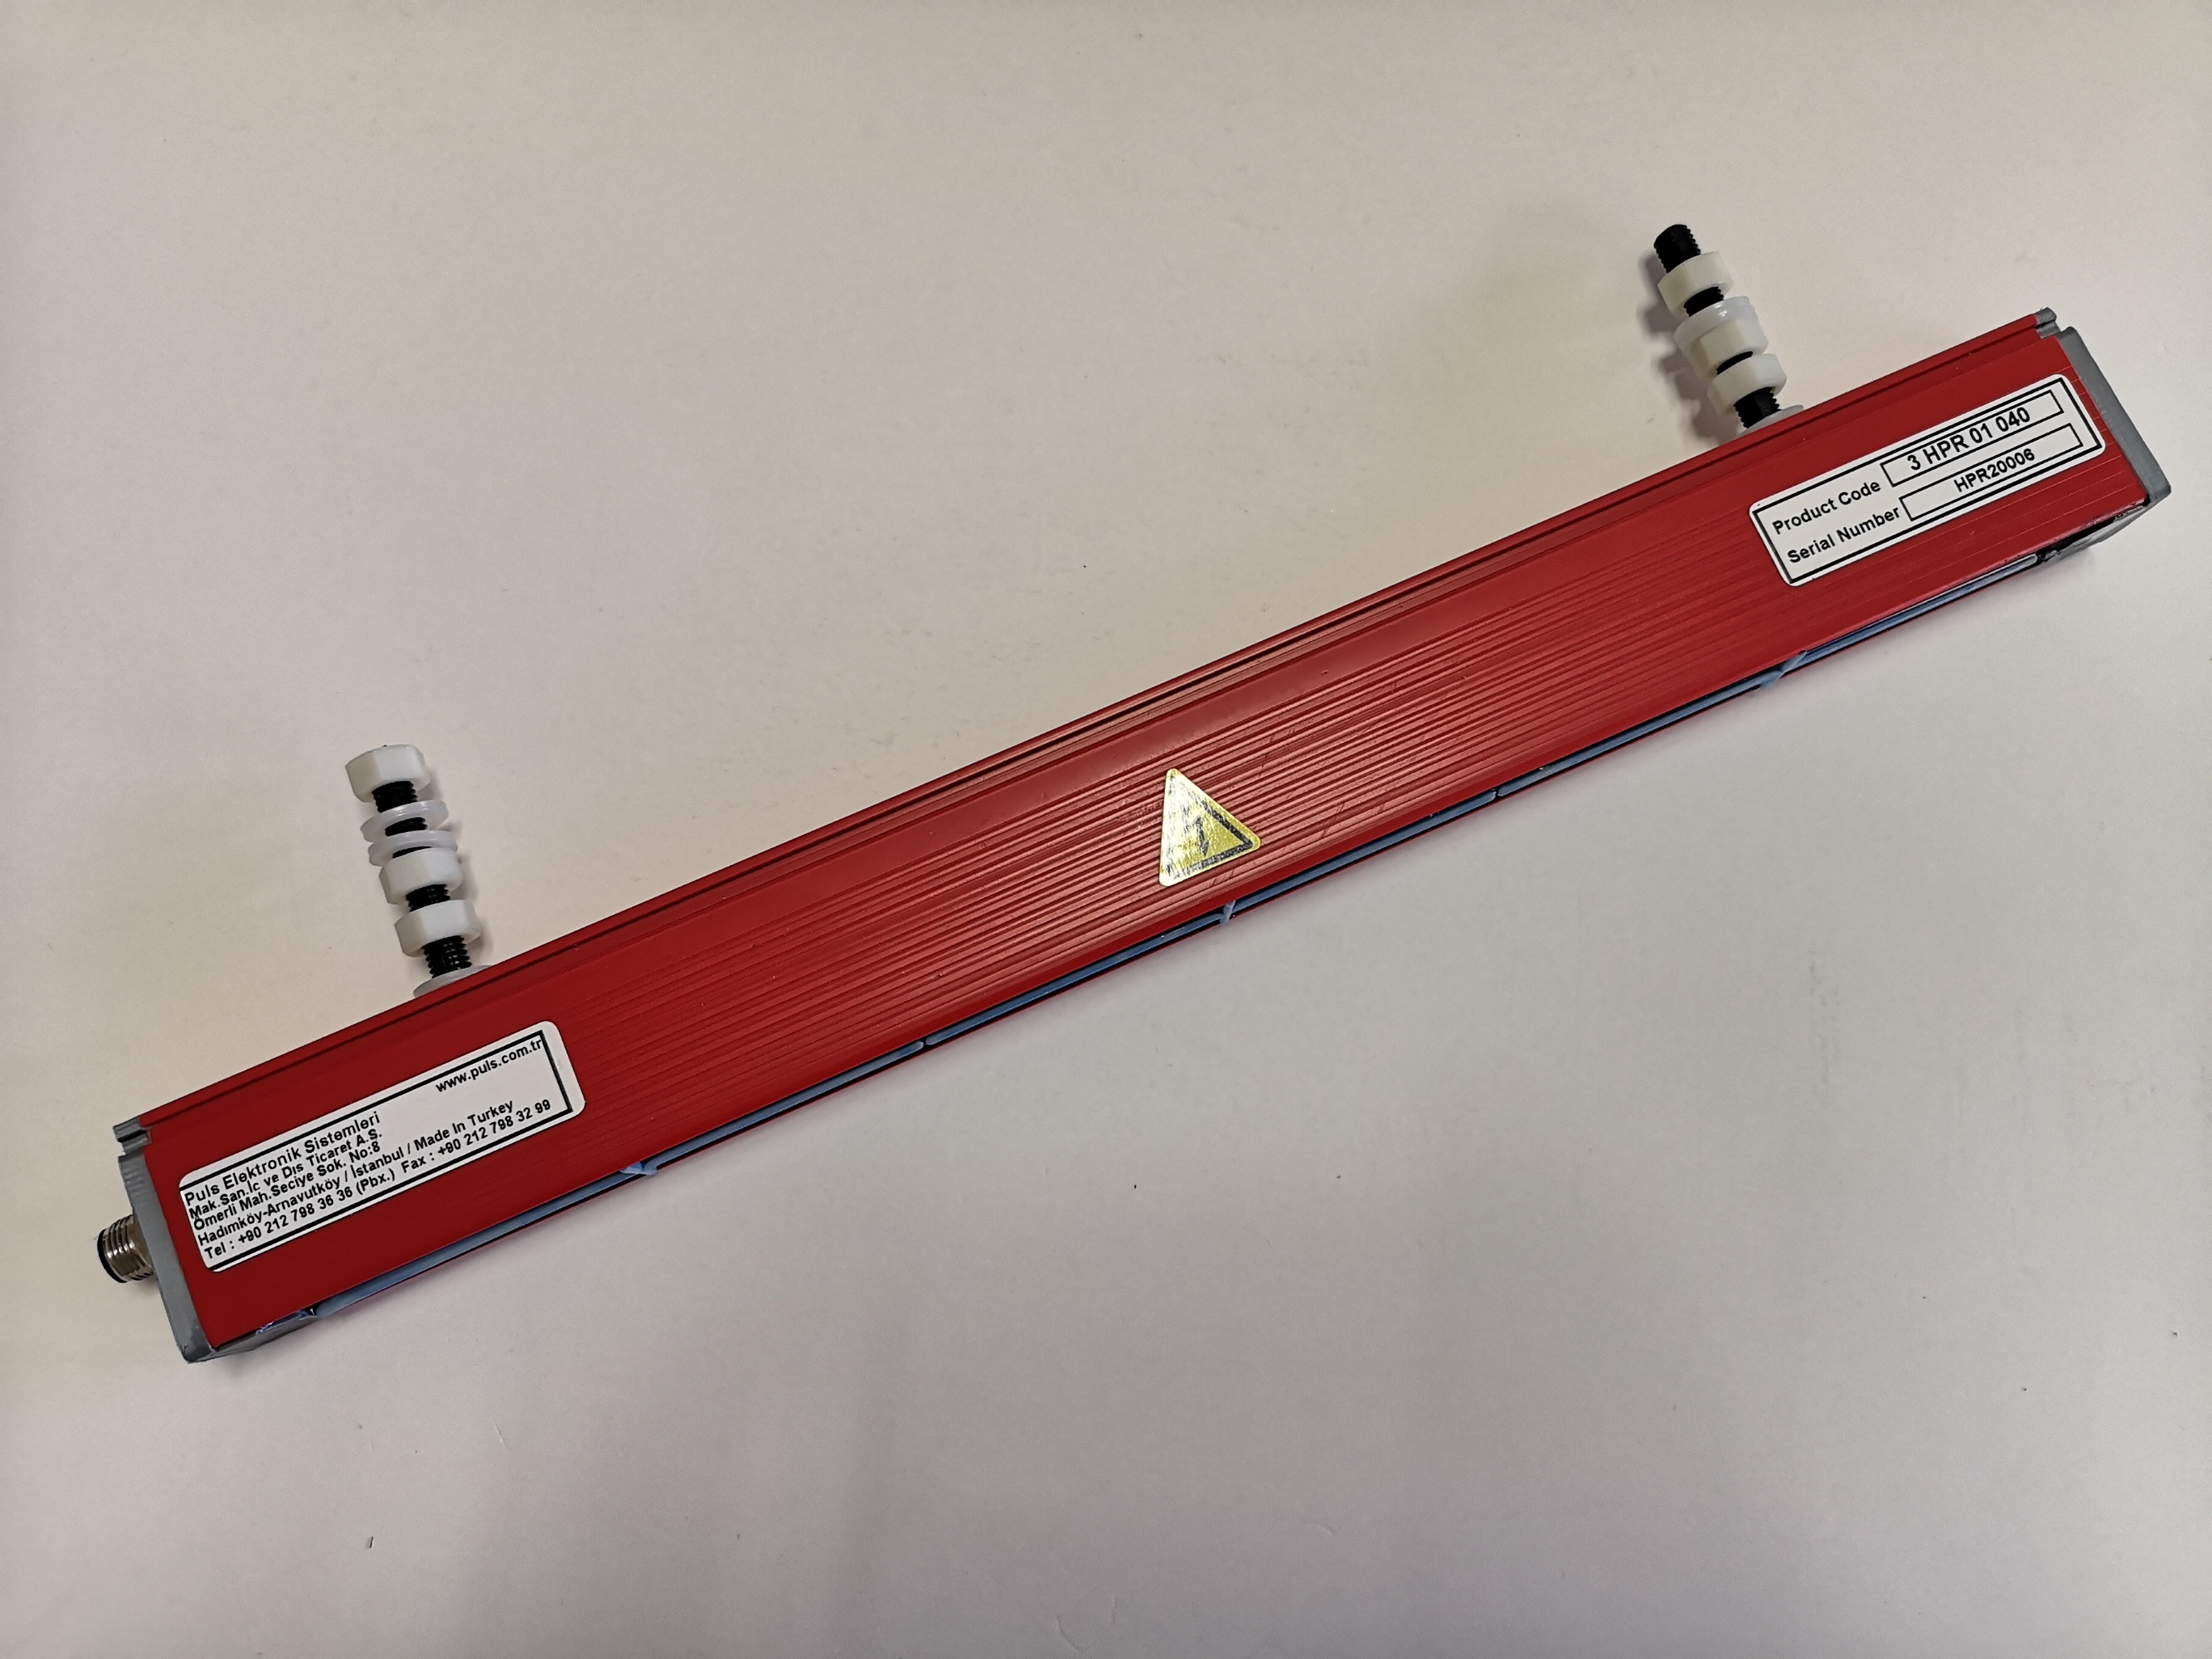 24VDC HIPER Antistatic Ionizing Bar